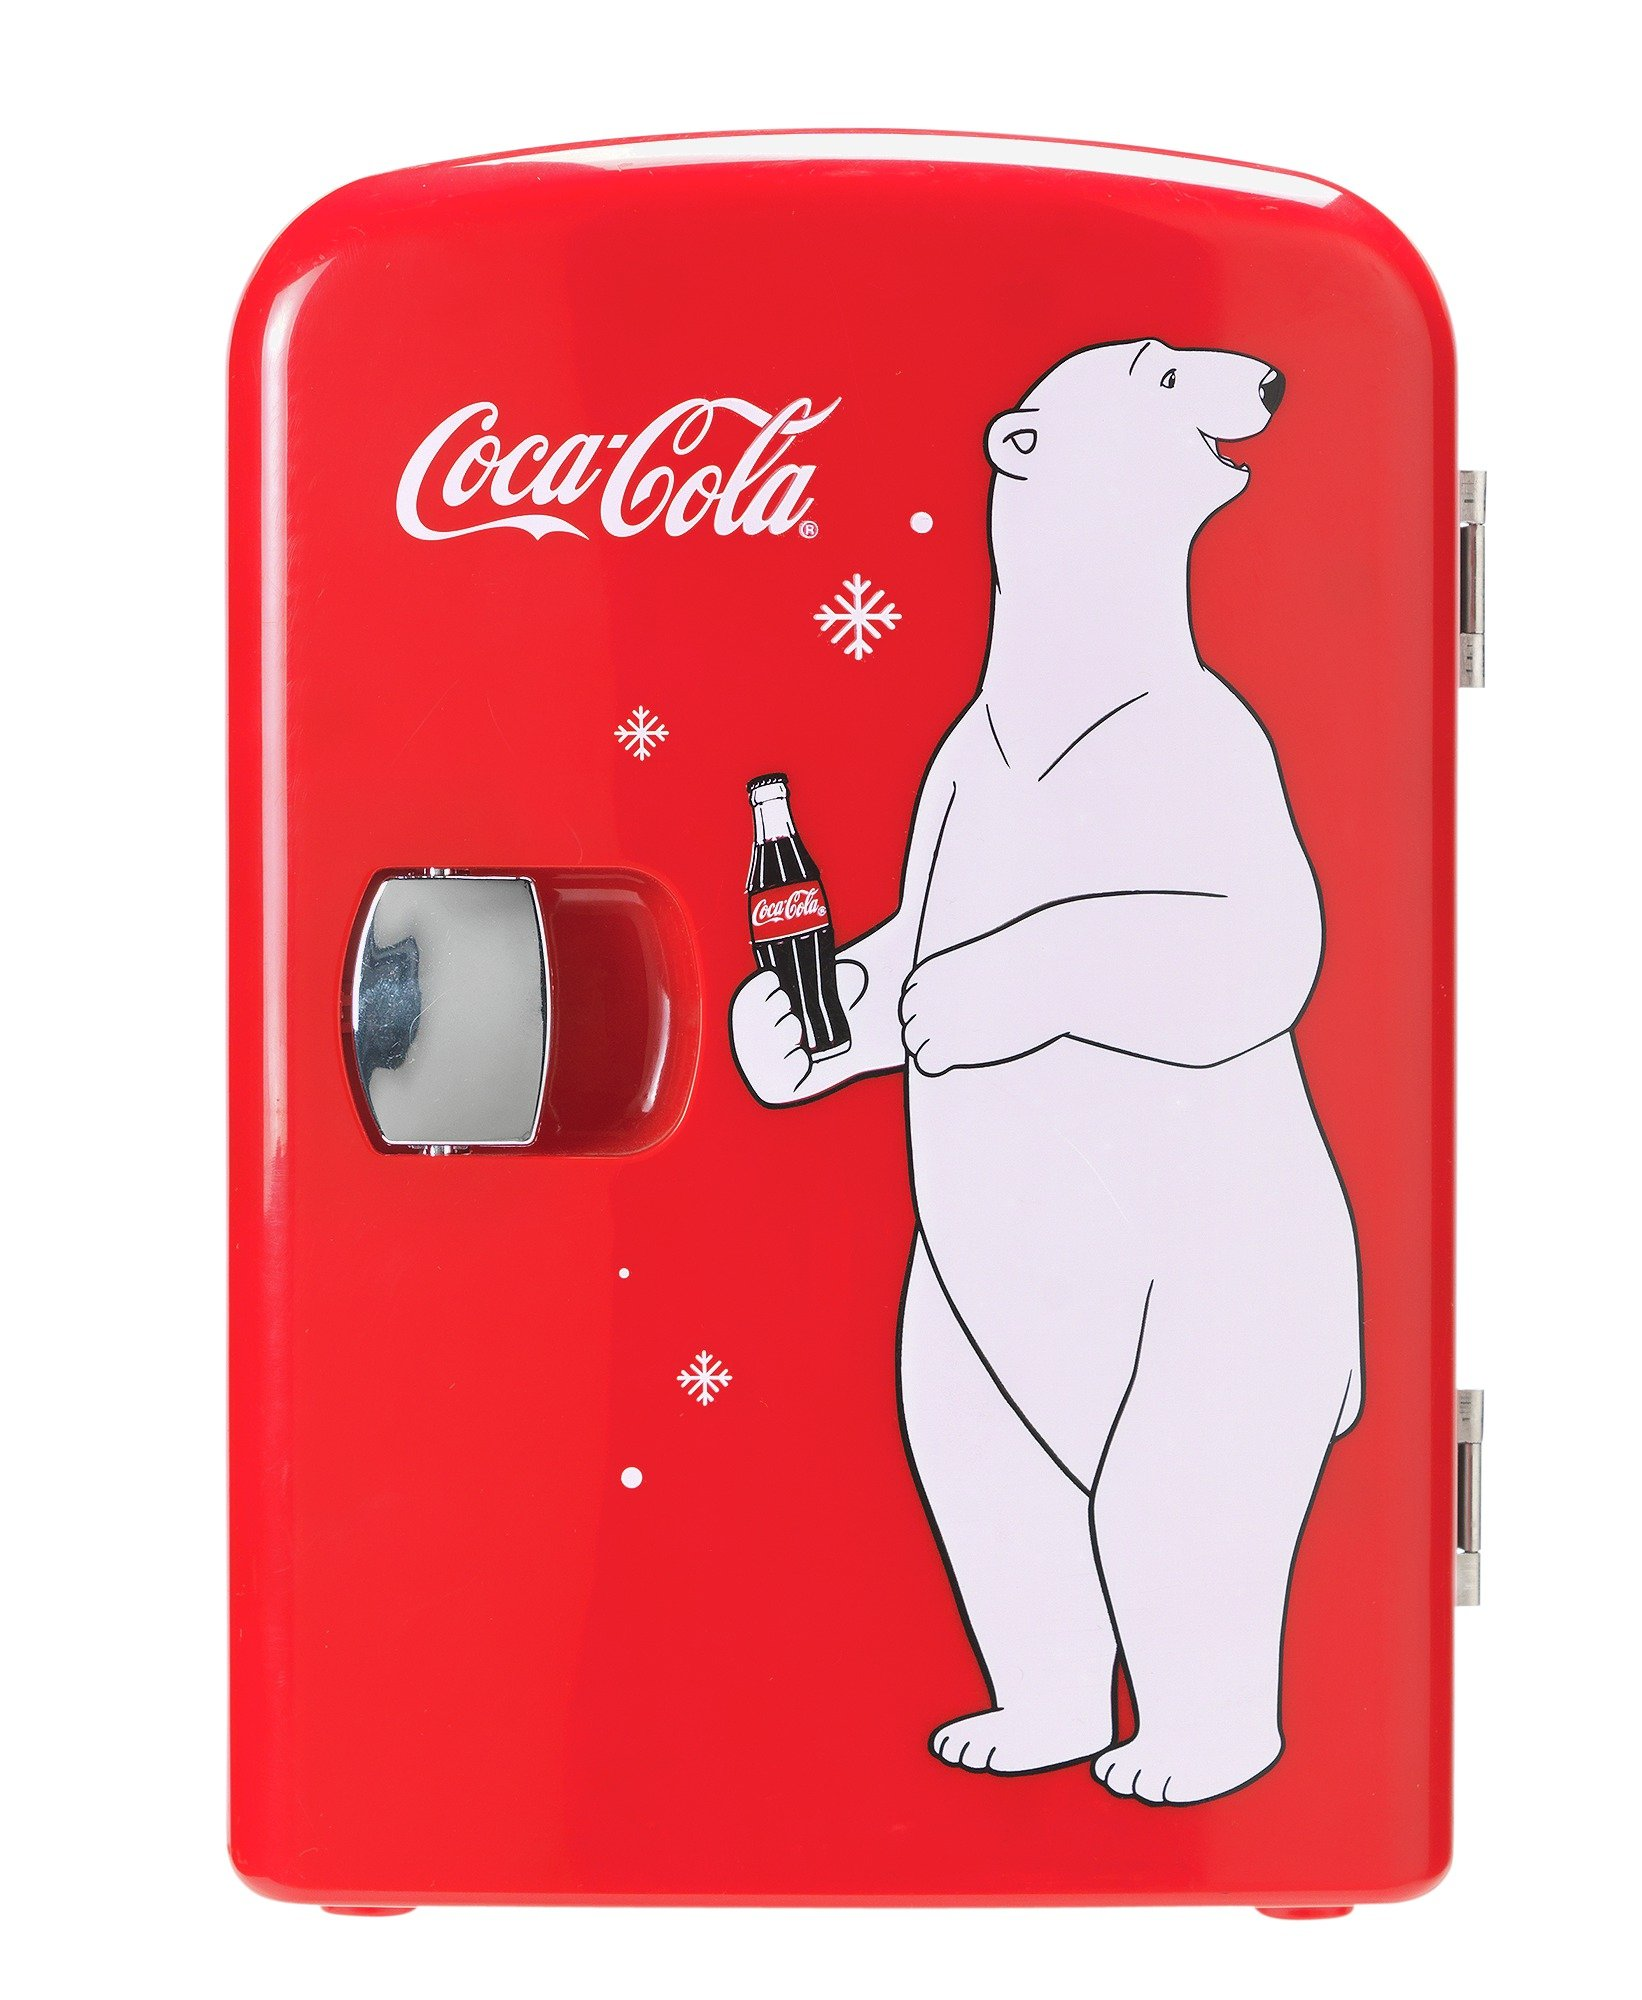 Coke Mini Fridge With Bear